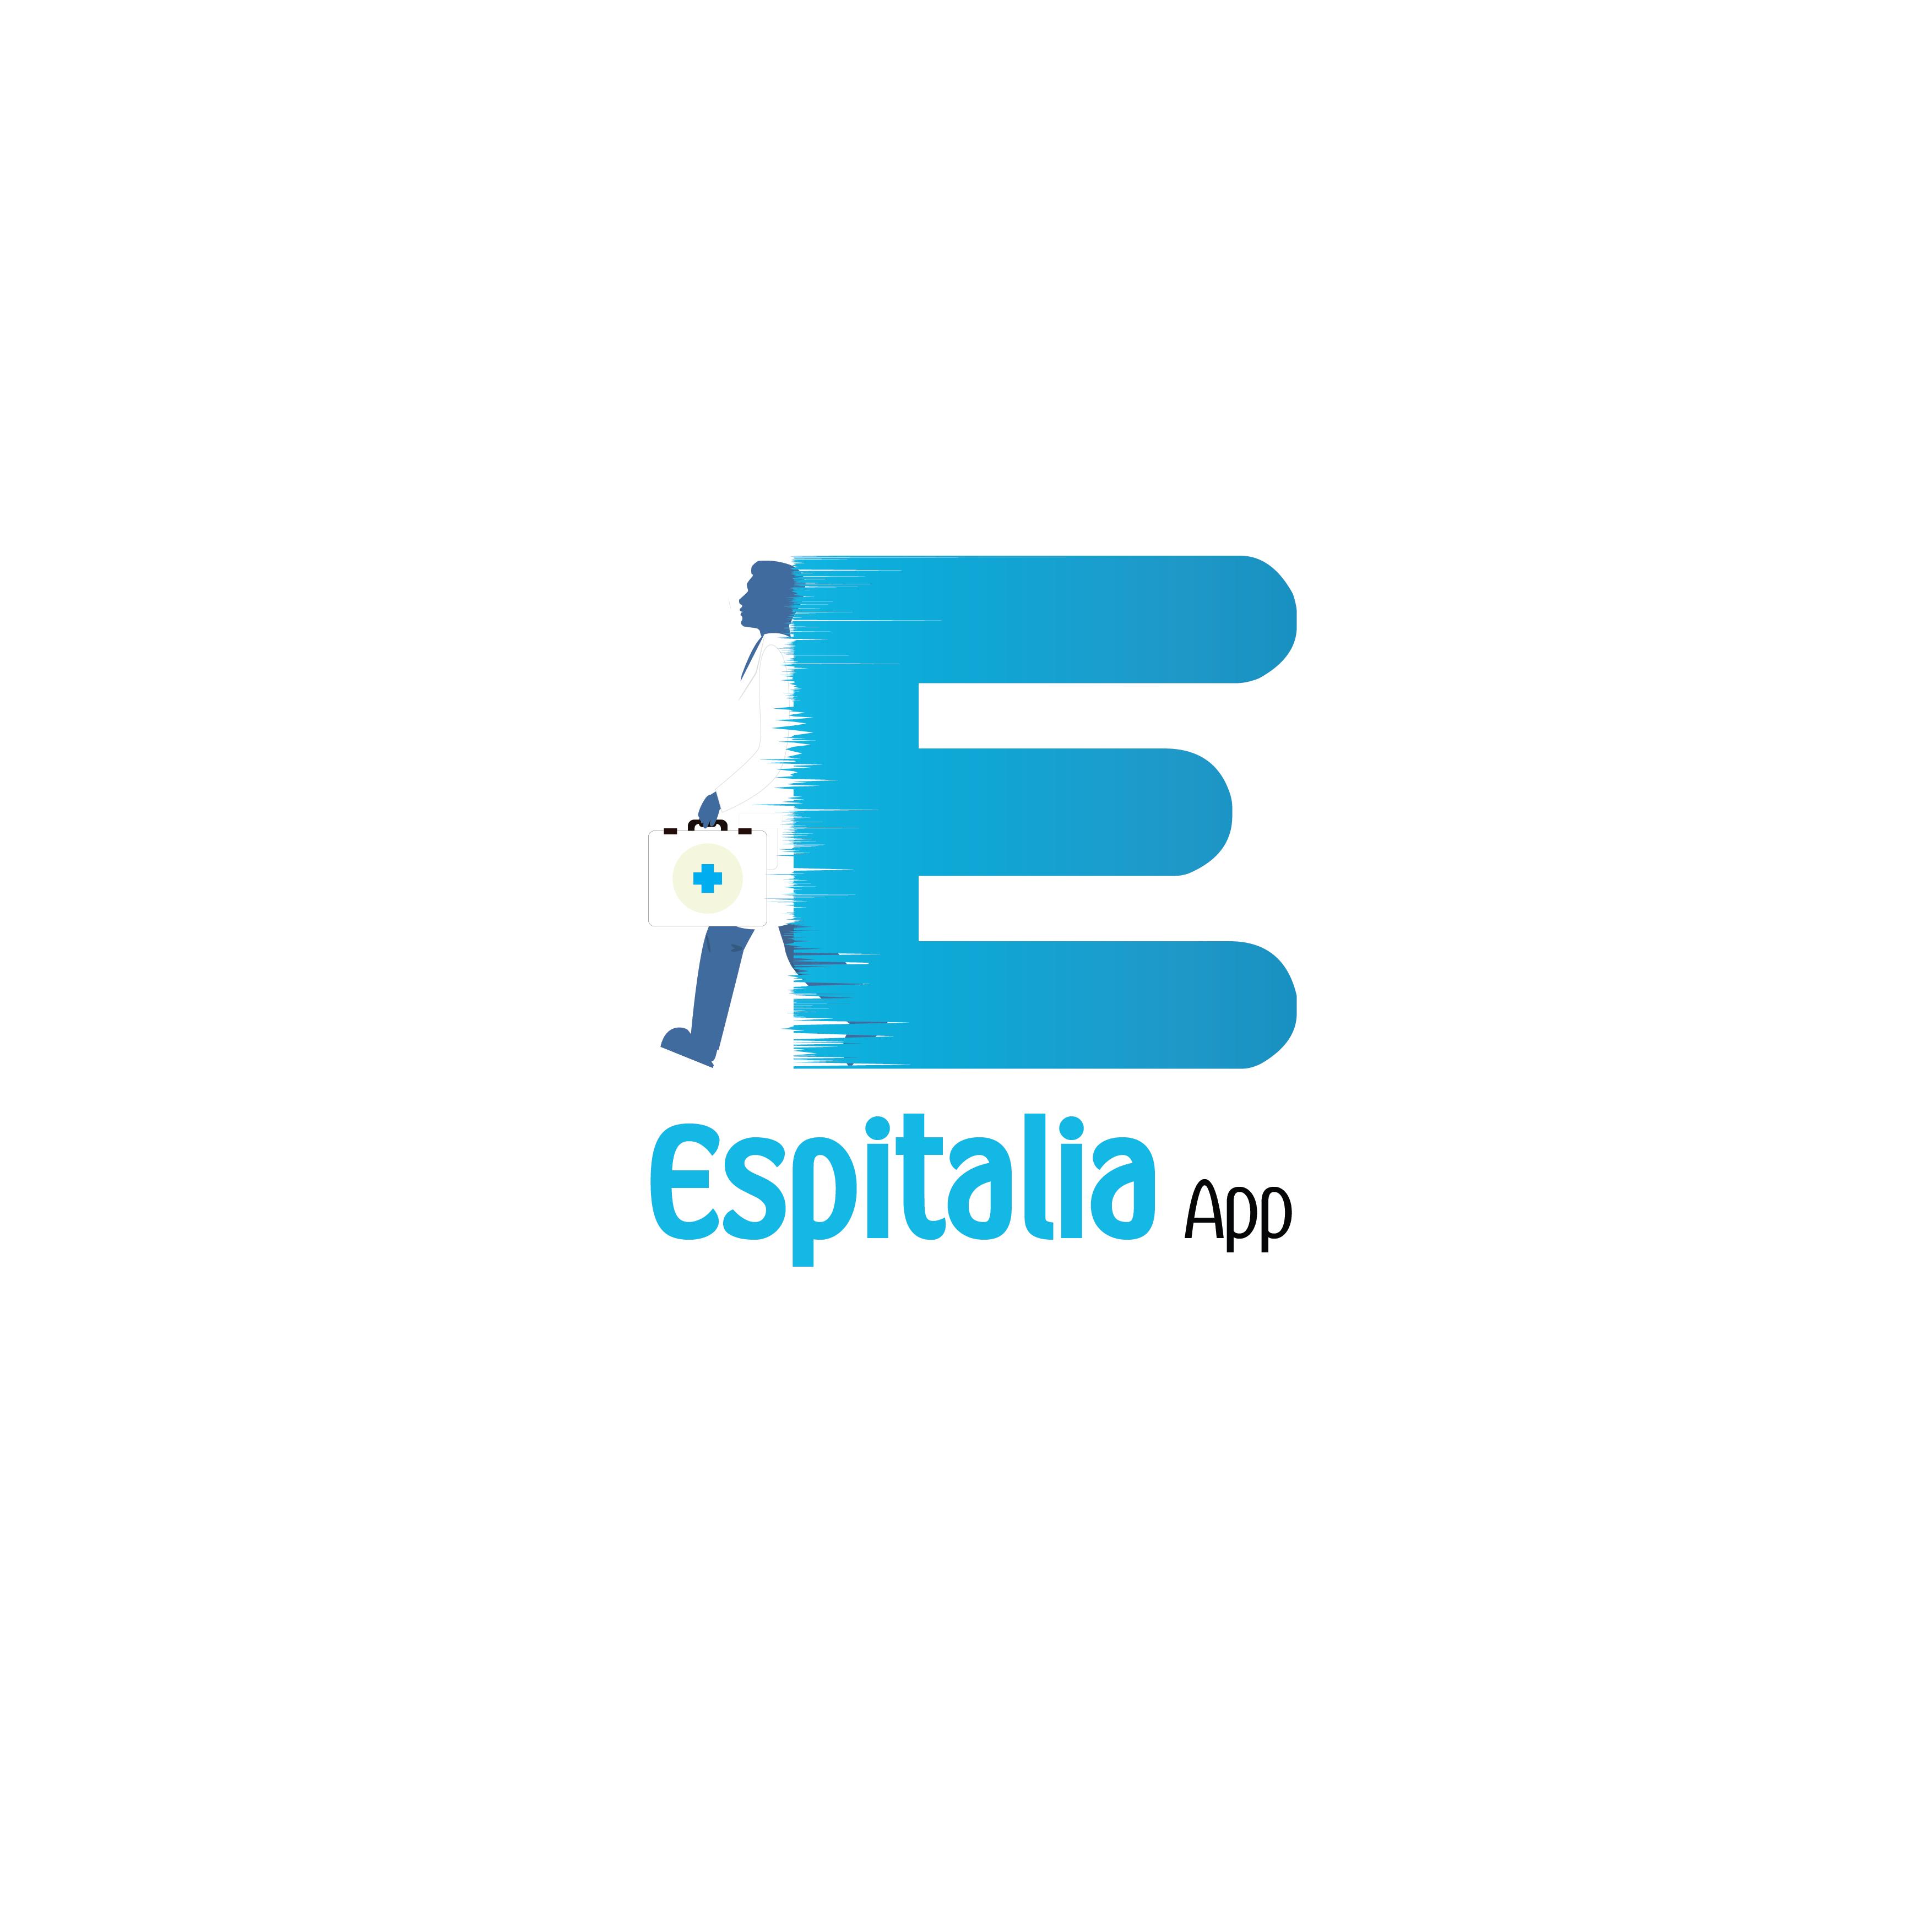 Espitalia App